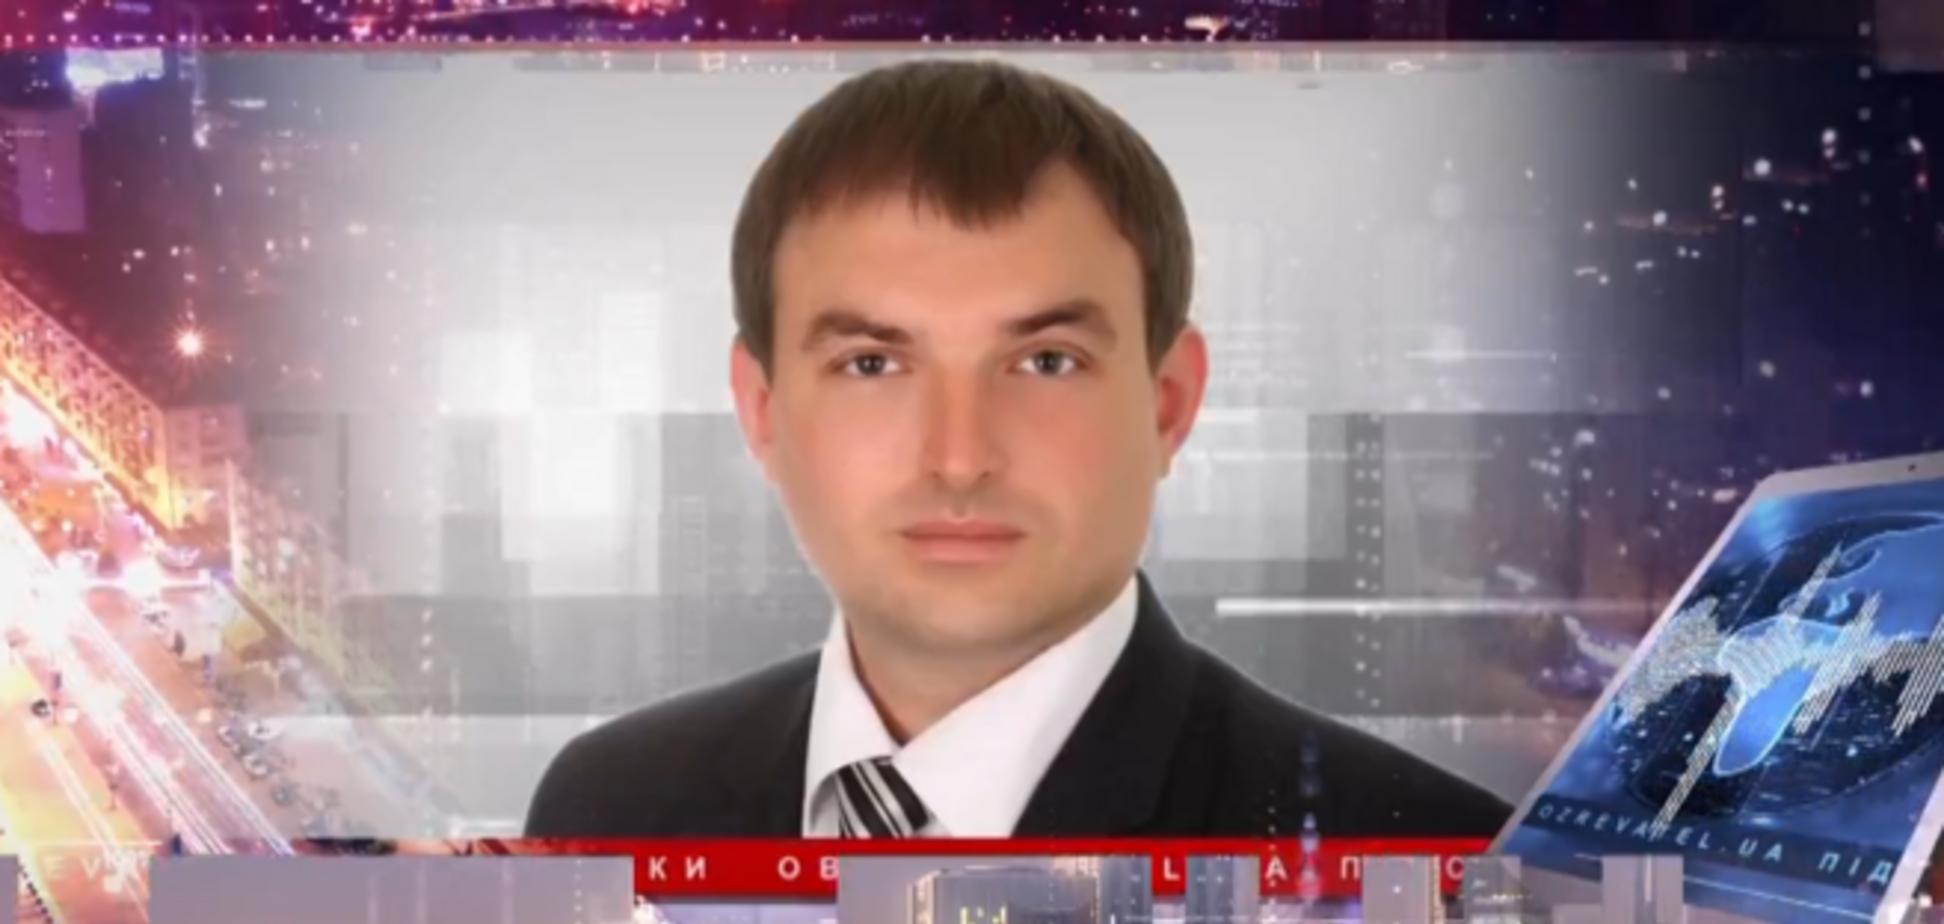 Вакарчуку в патенте на название партии могут отказать: адвокат объяснил почему